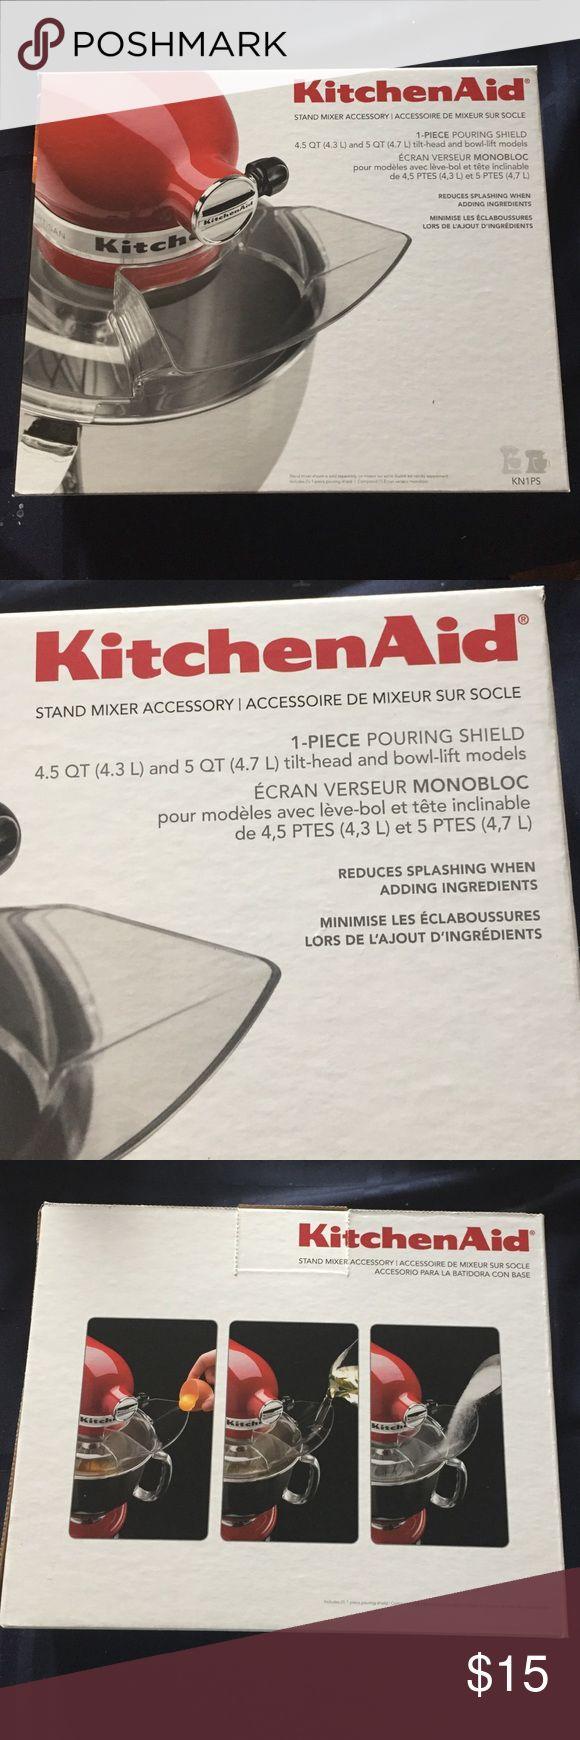 NIB kitchenAid 1 piece pouring shield New in box kitchenAid stand mixer accessory, 1 piece pouring shield. Retails $19.99 kitchenaid  Other